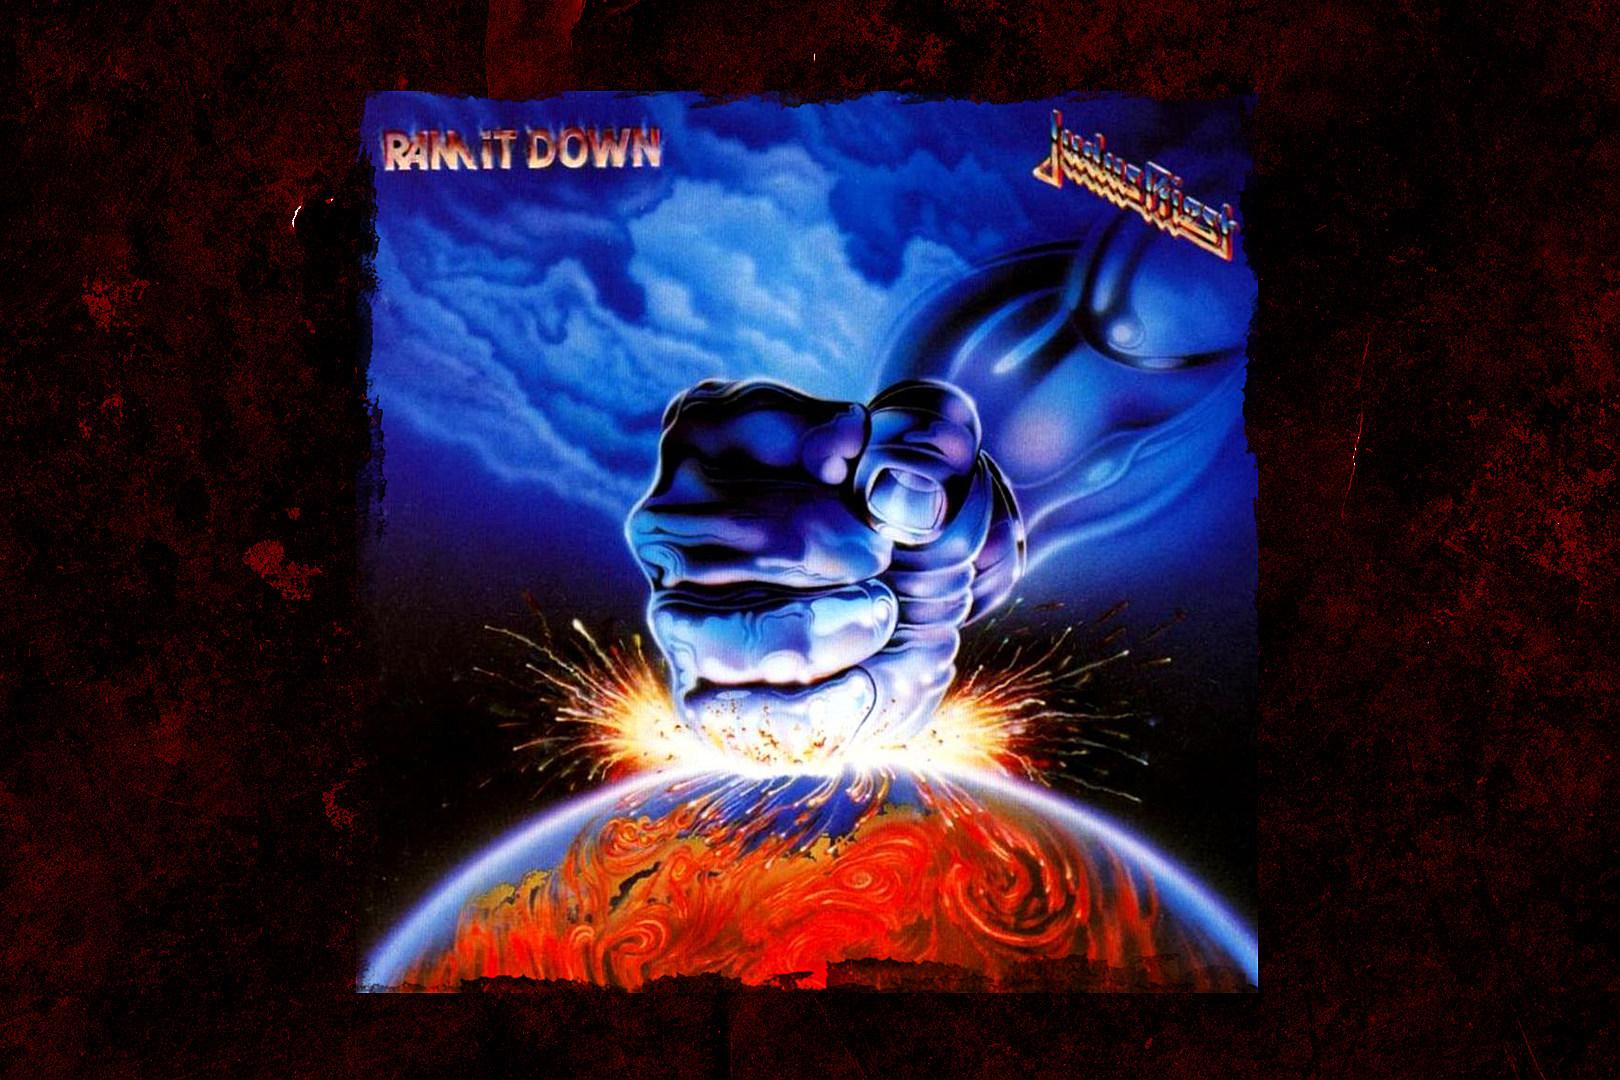 33 Years Ago: Judas Priest Flash Metal Form on 'Ram It Down'